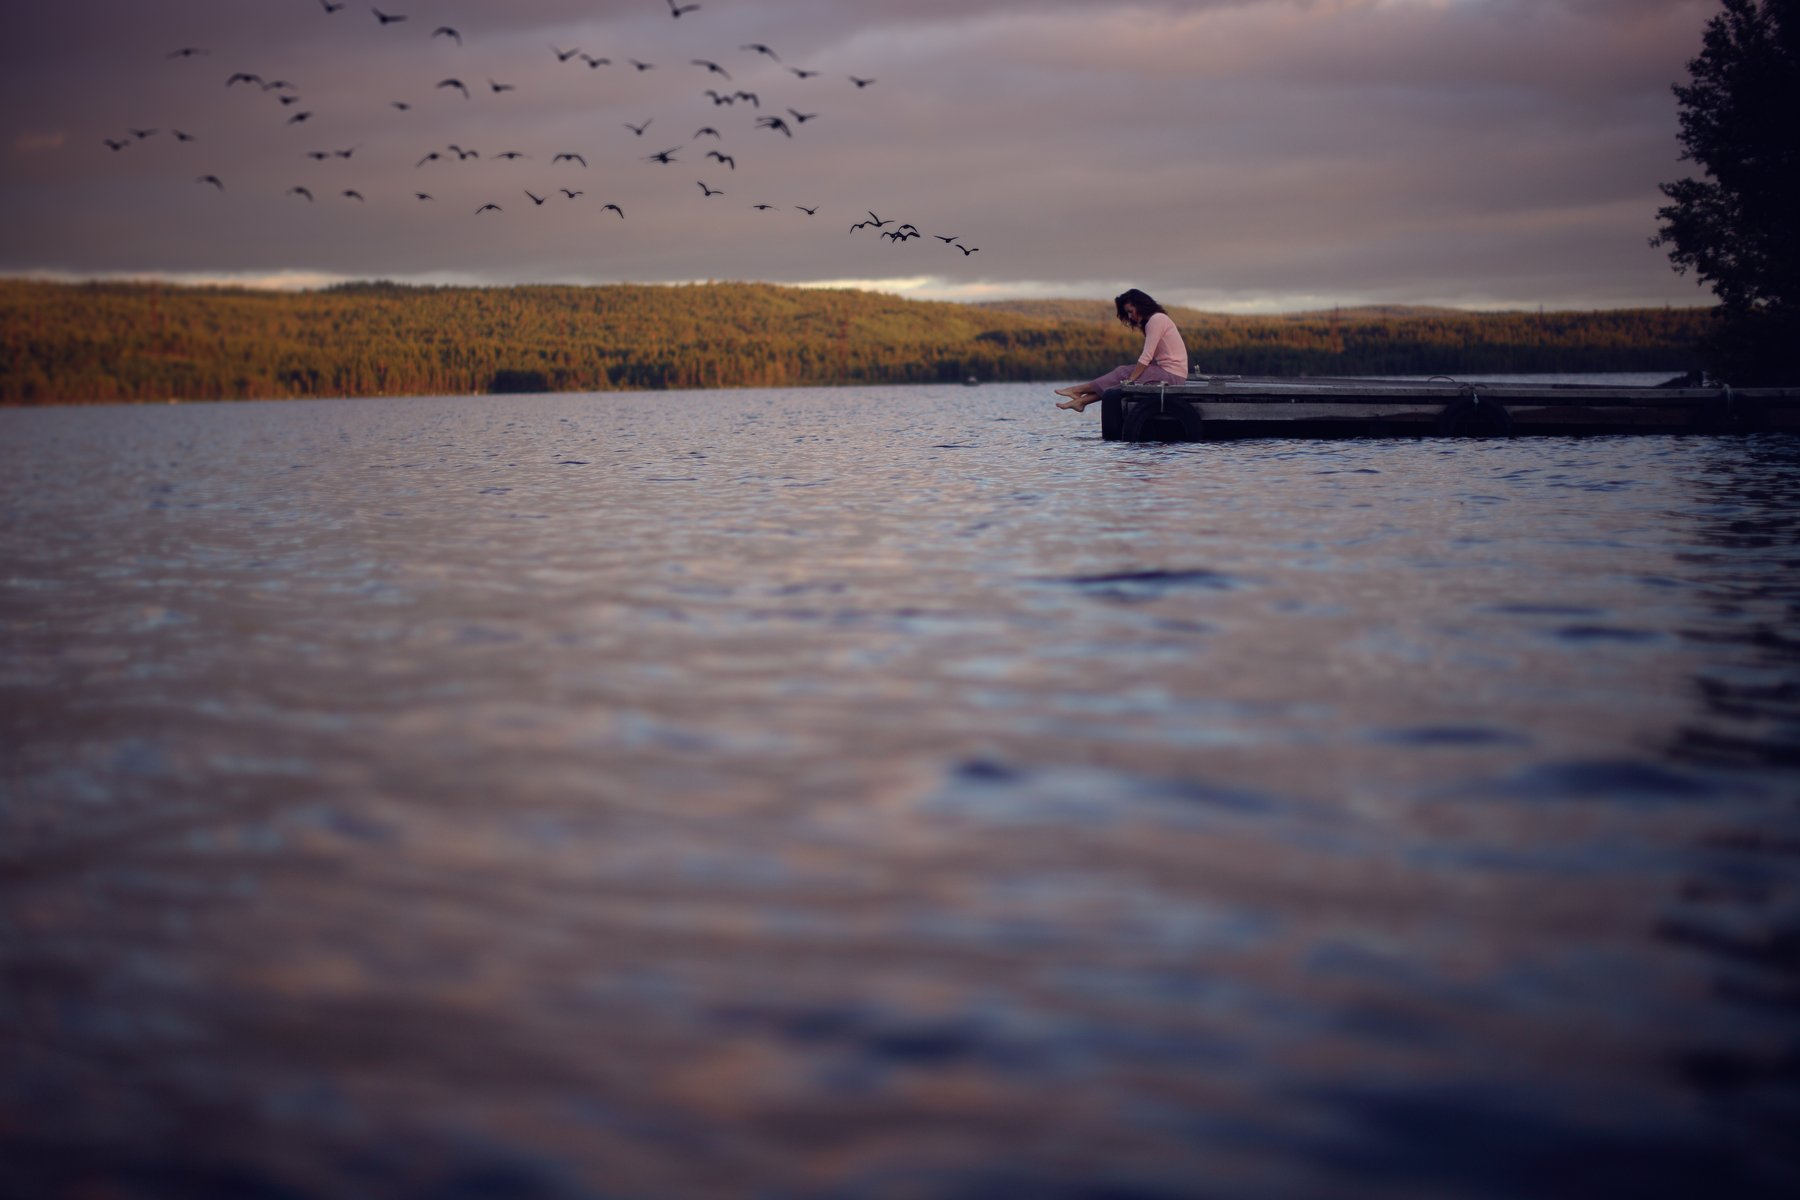 beach beautiful birds boat clouds dream girl lake light nature ocean pier river sky sunset water wave, Анна Луценко